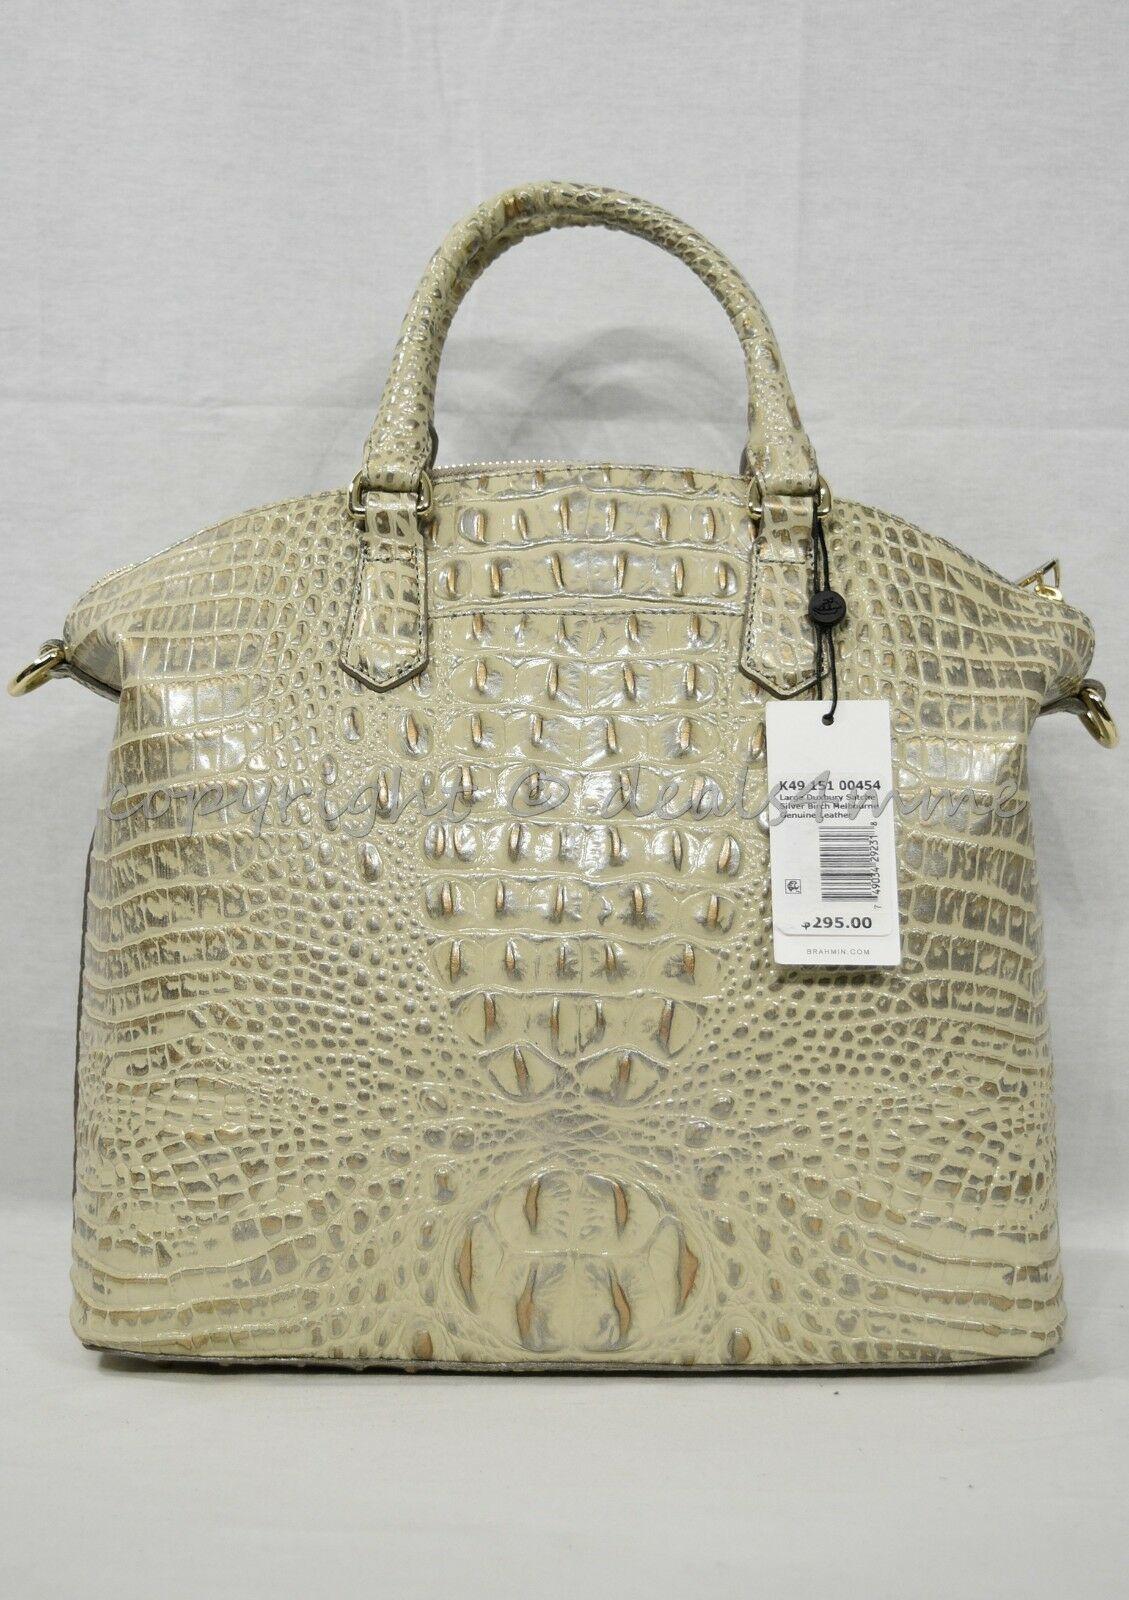 NWT Brahmin Large Leather Duxbury Satchel/Shoulder Bag in Silver Birch Melbourne image 7